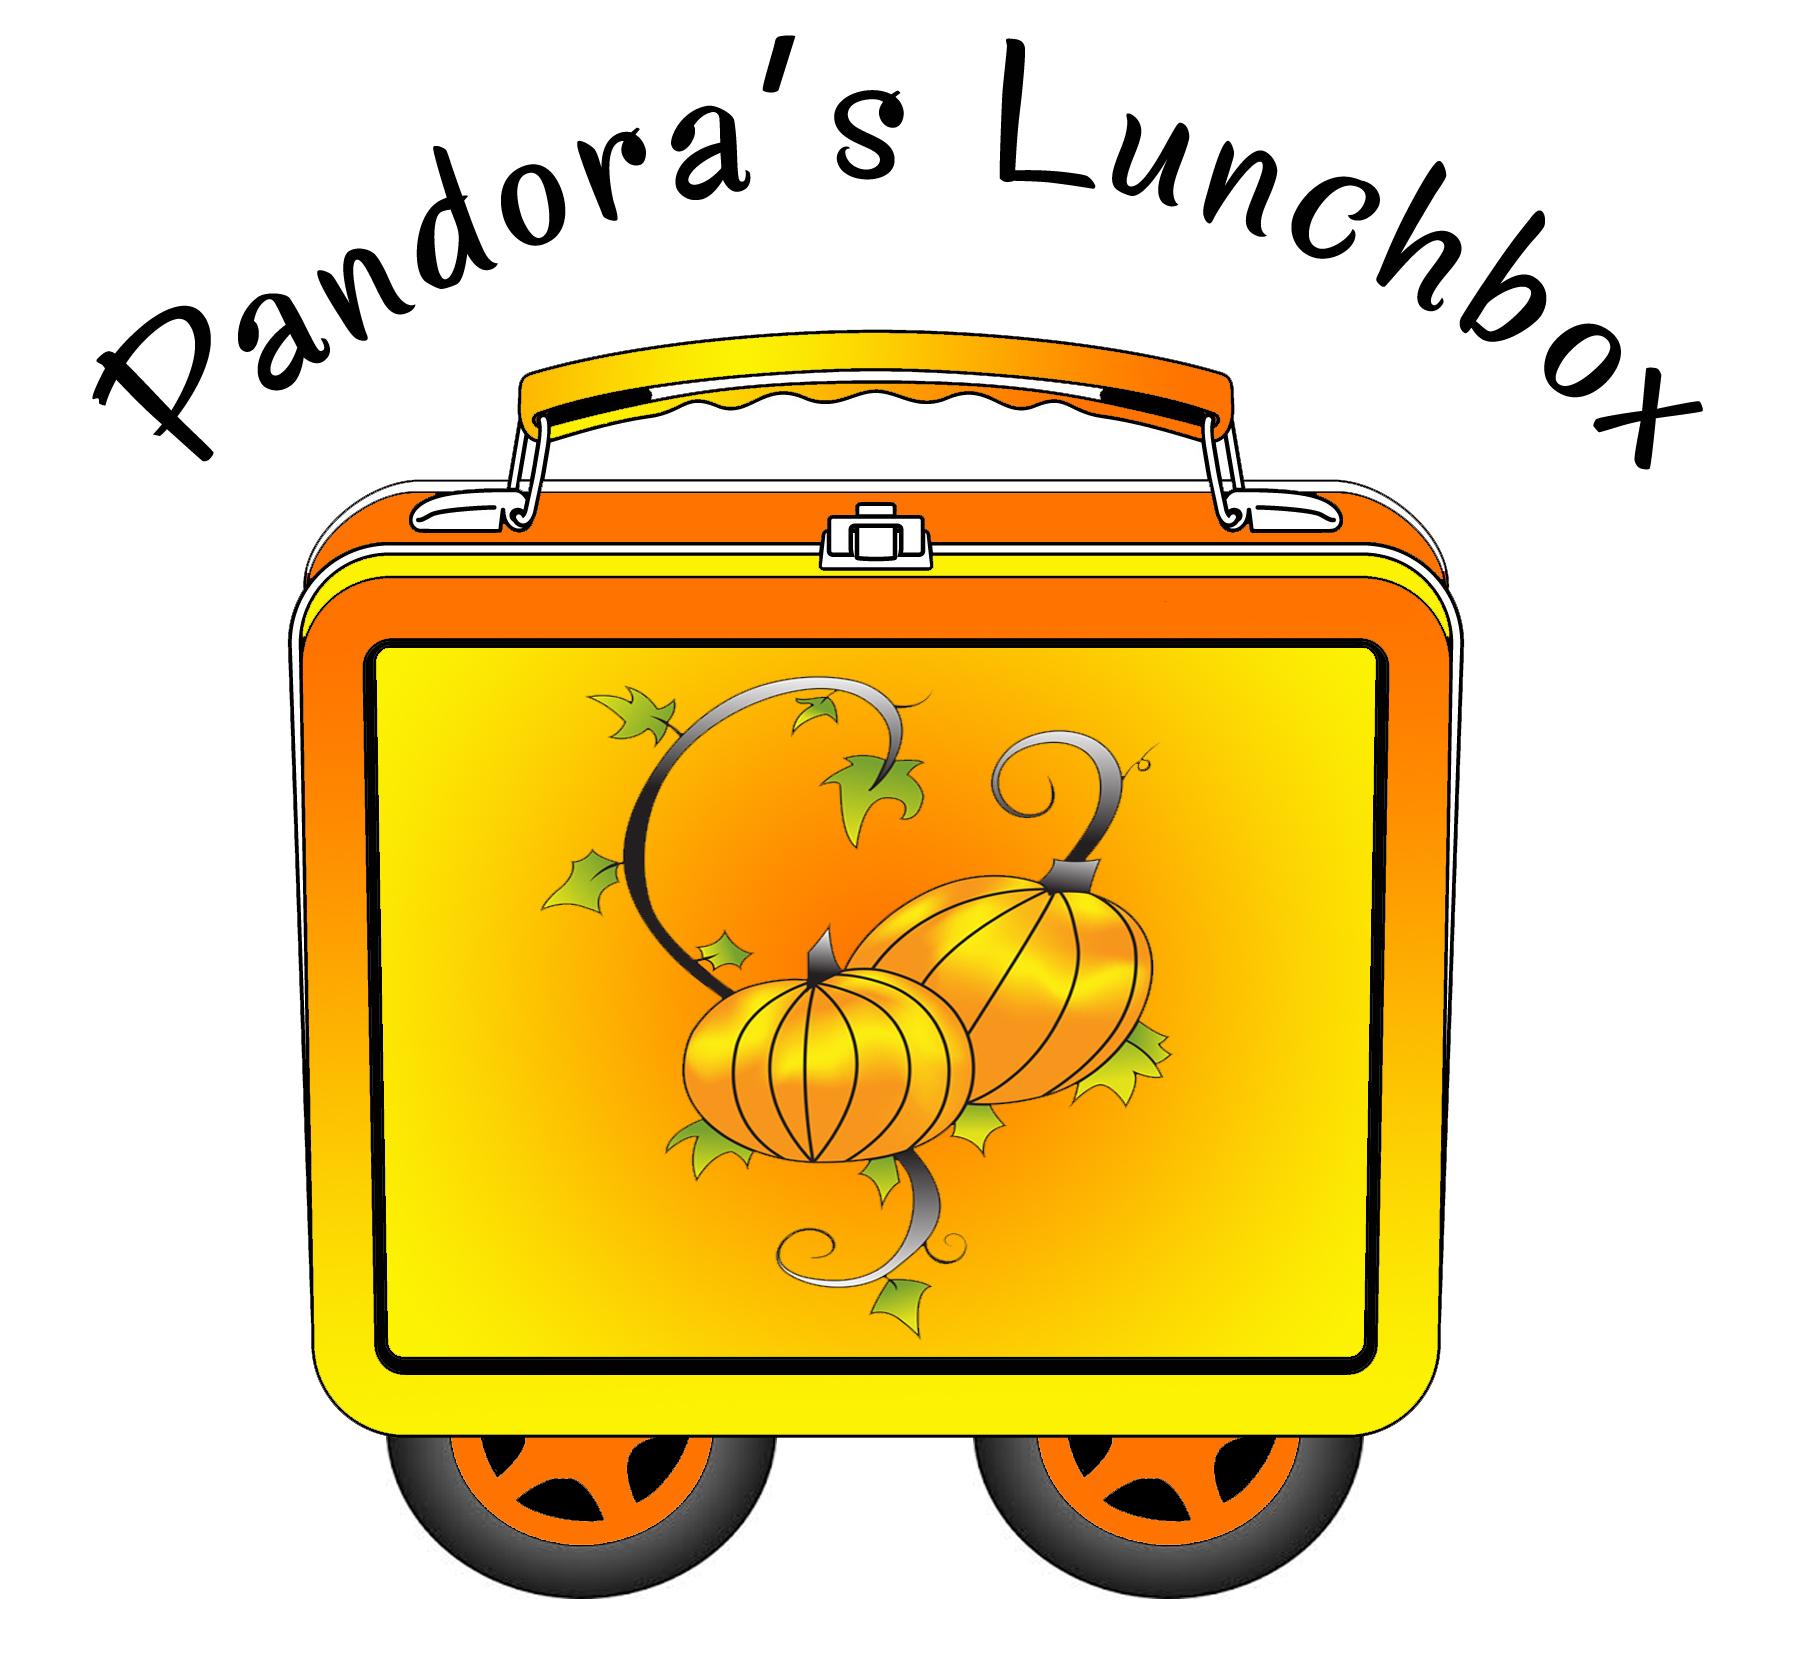 Pandora's Lunchbox Mission Statement | Pandoras ProductsPandoras ...